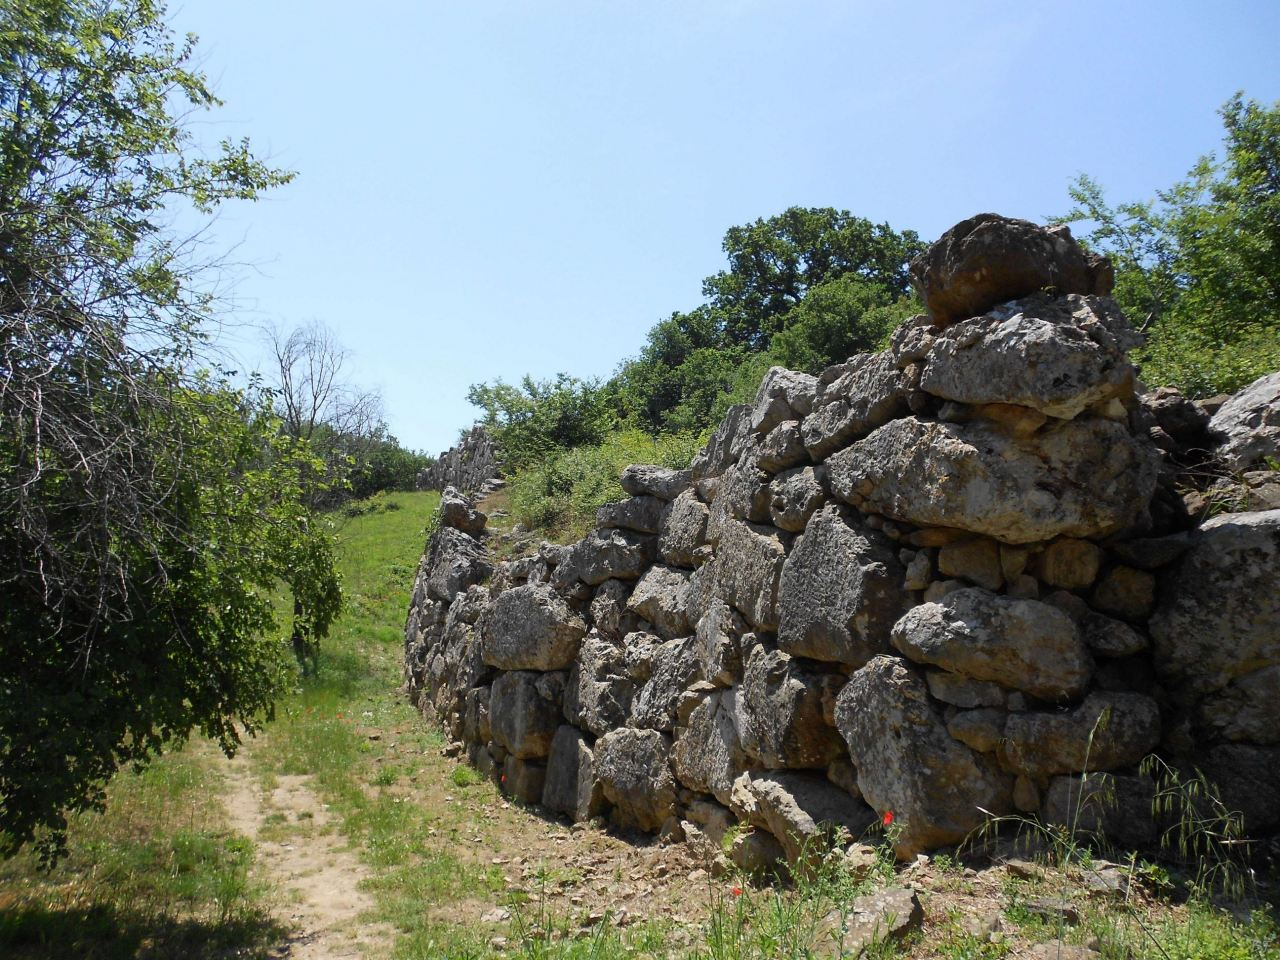 Roselle-Mura-Megalitiche-Roselle-Grosseto-Toscana-Italia-44